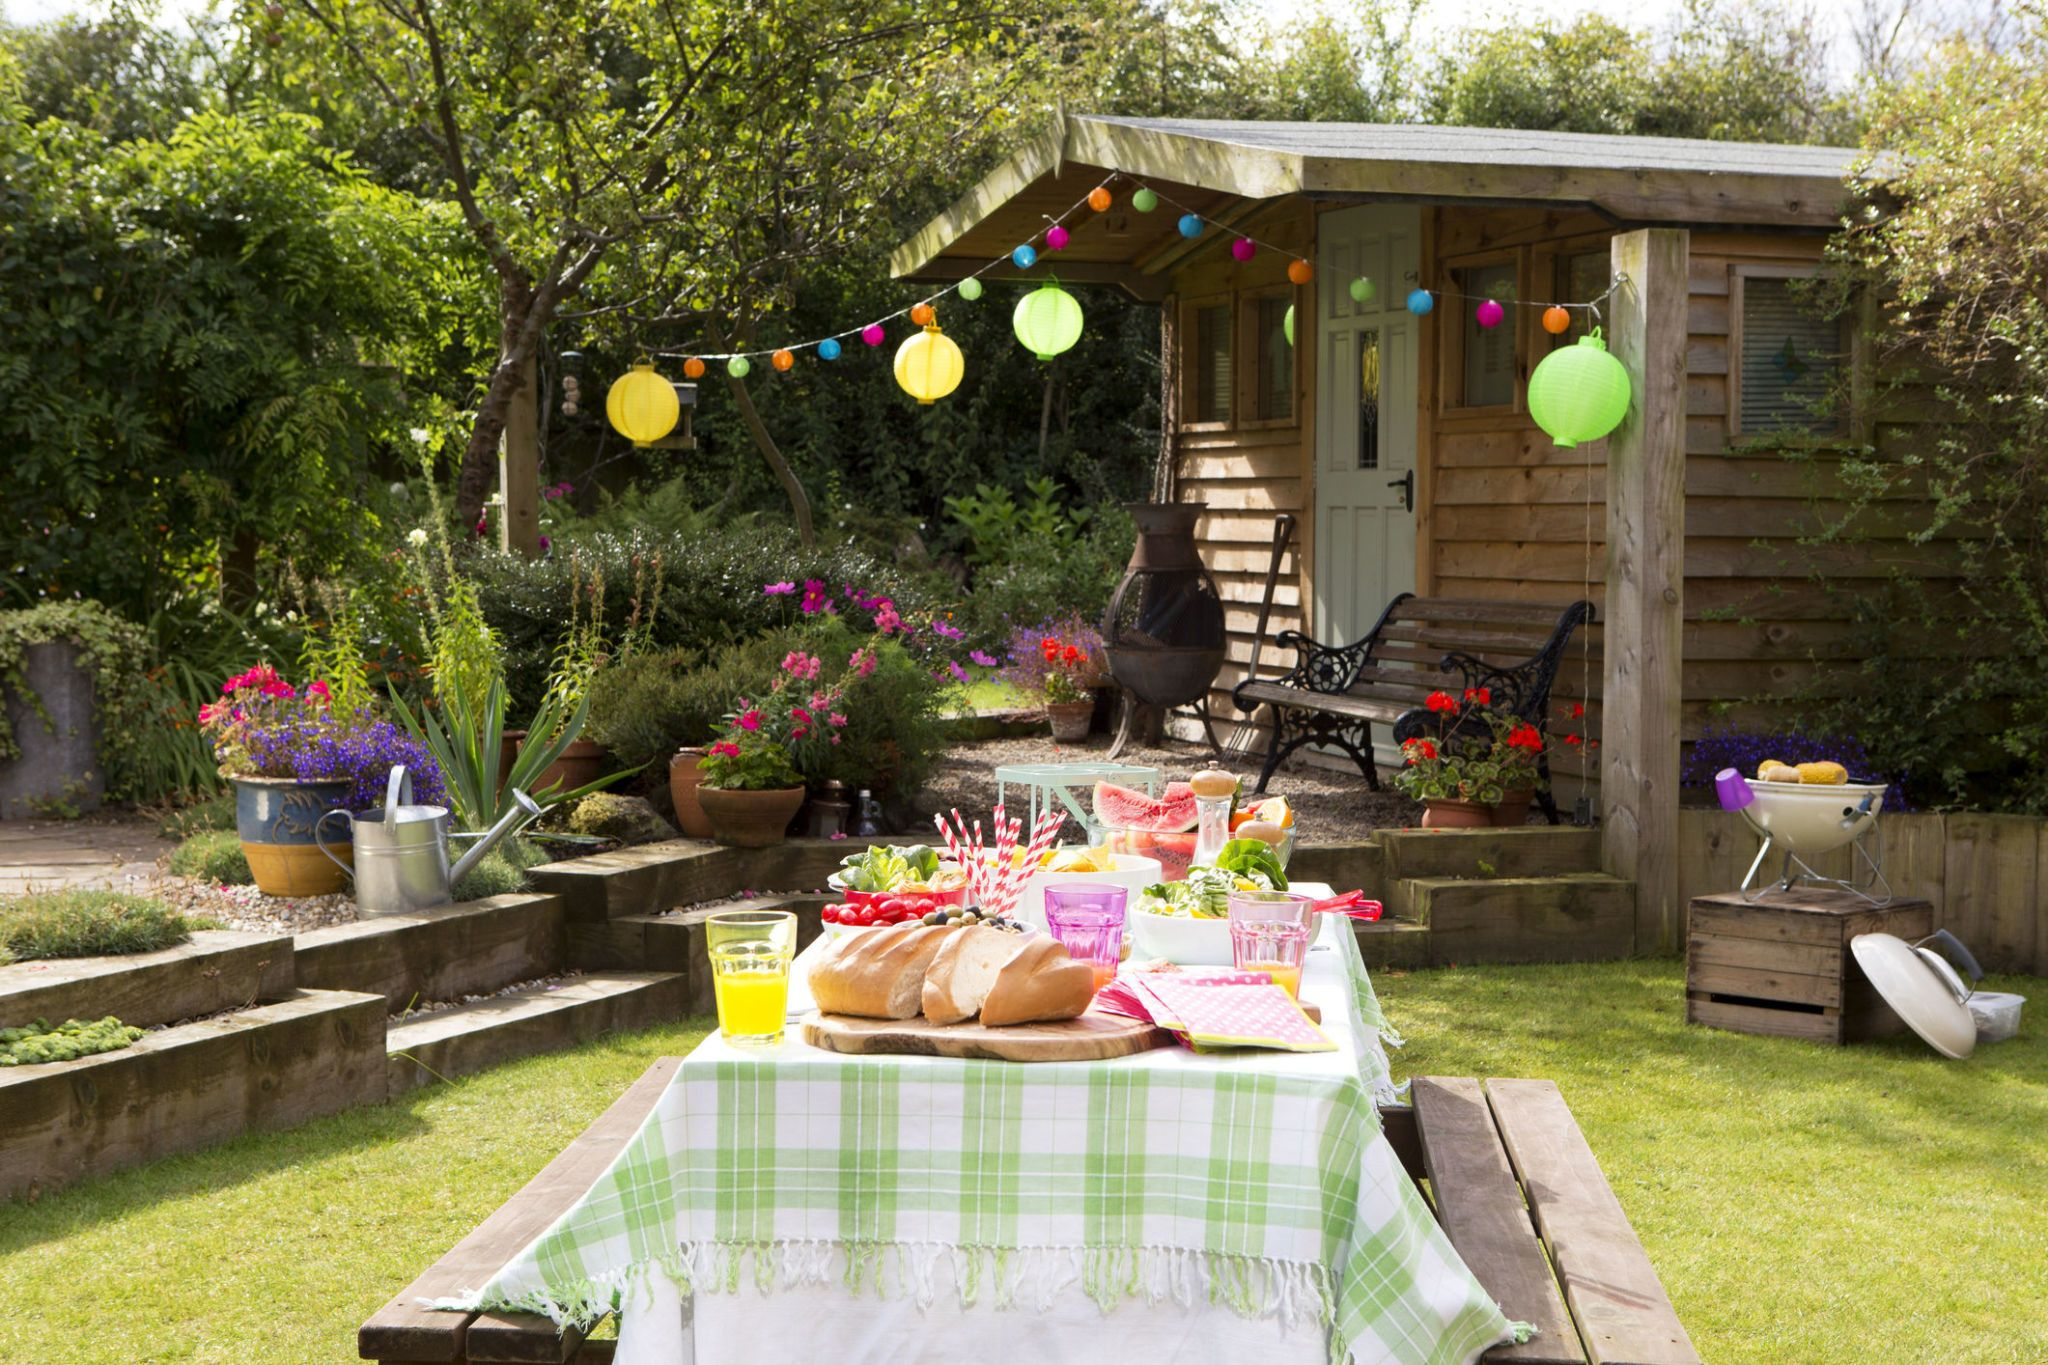 Superbe Garden Set Up Ready For A Barbecue